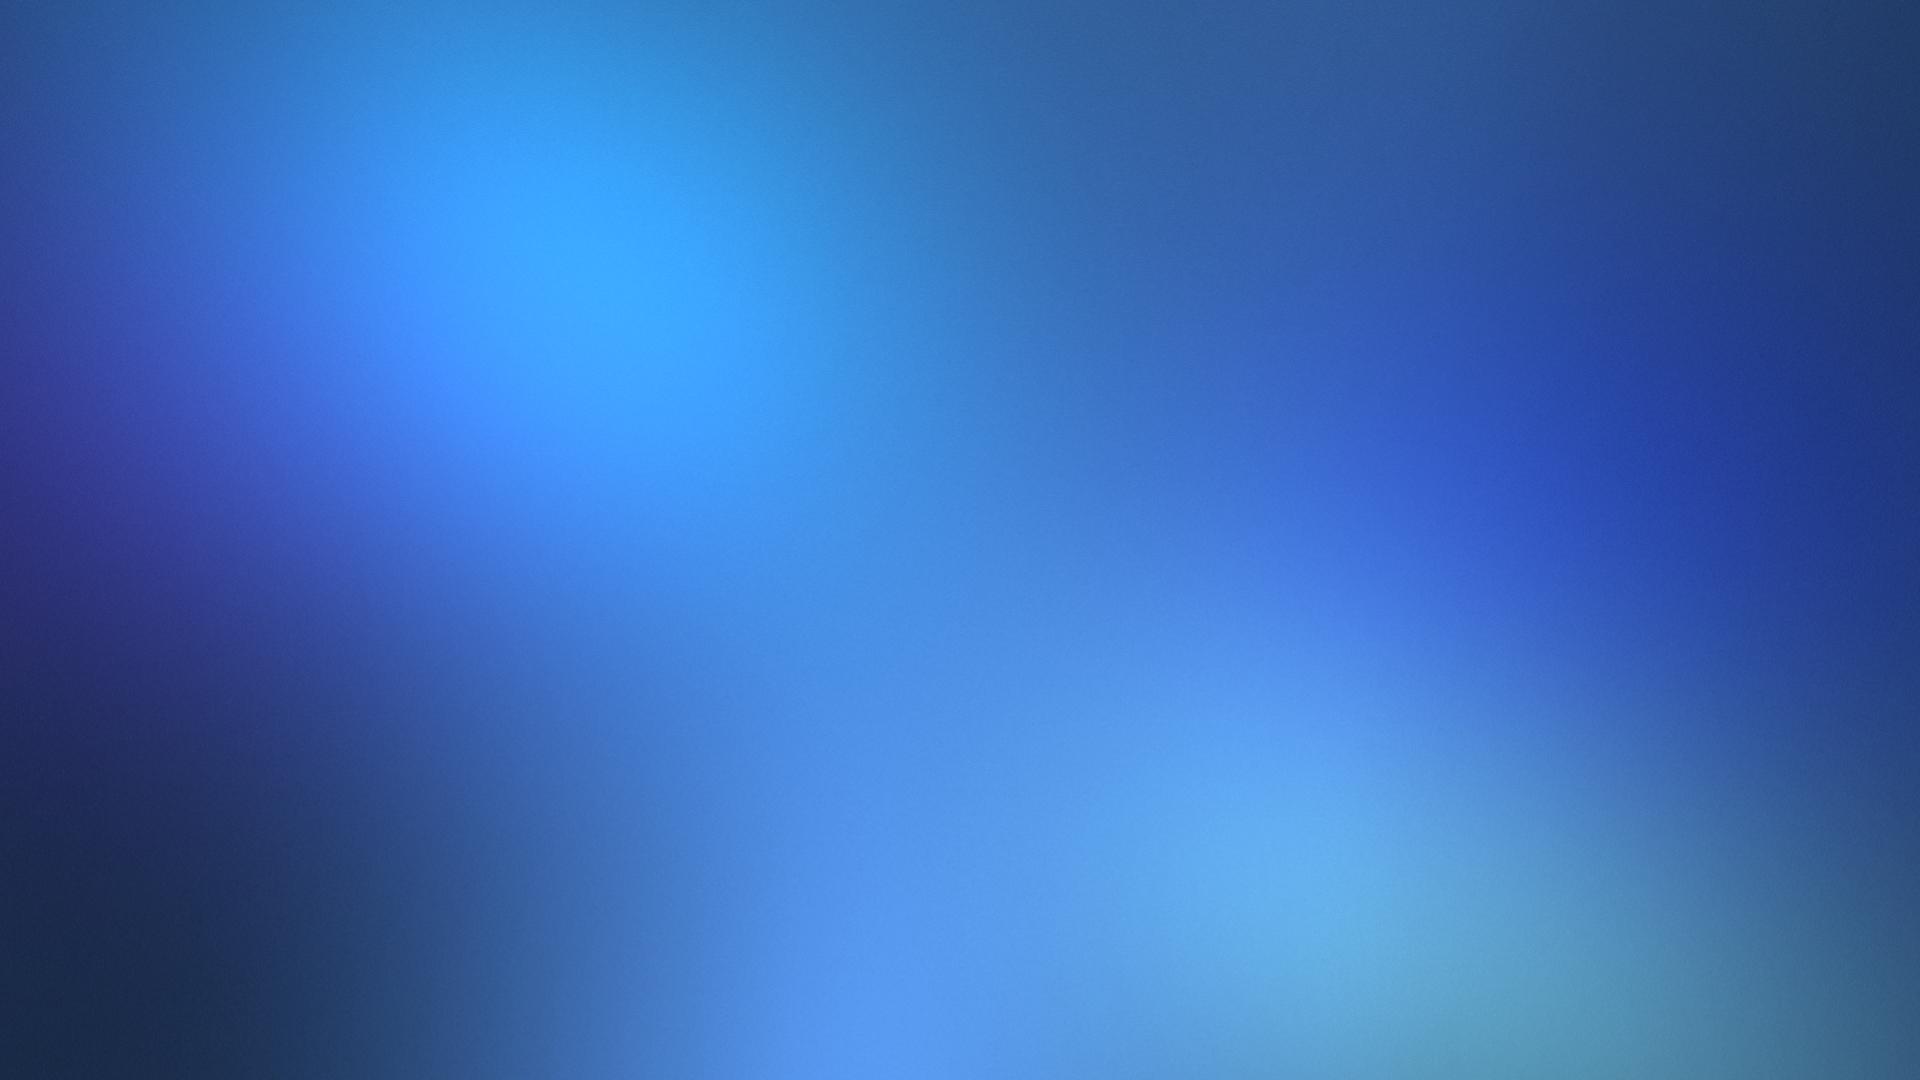 Free Download 10 1 2014 Wallpaper 1280x800 Wallpaper Tablet